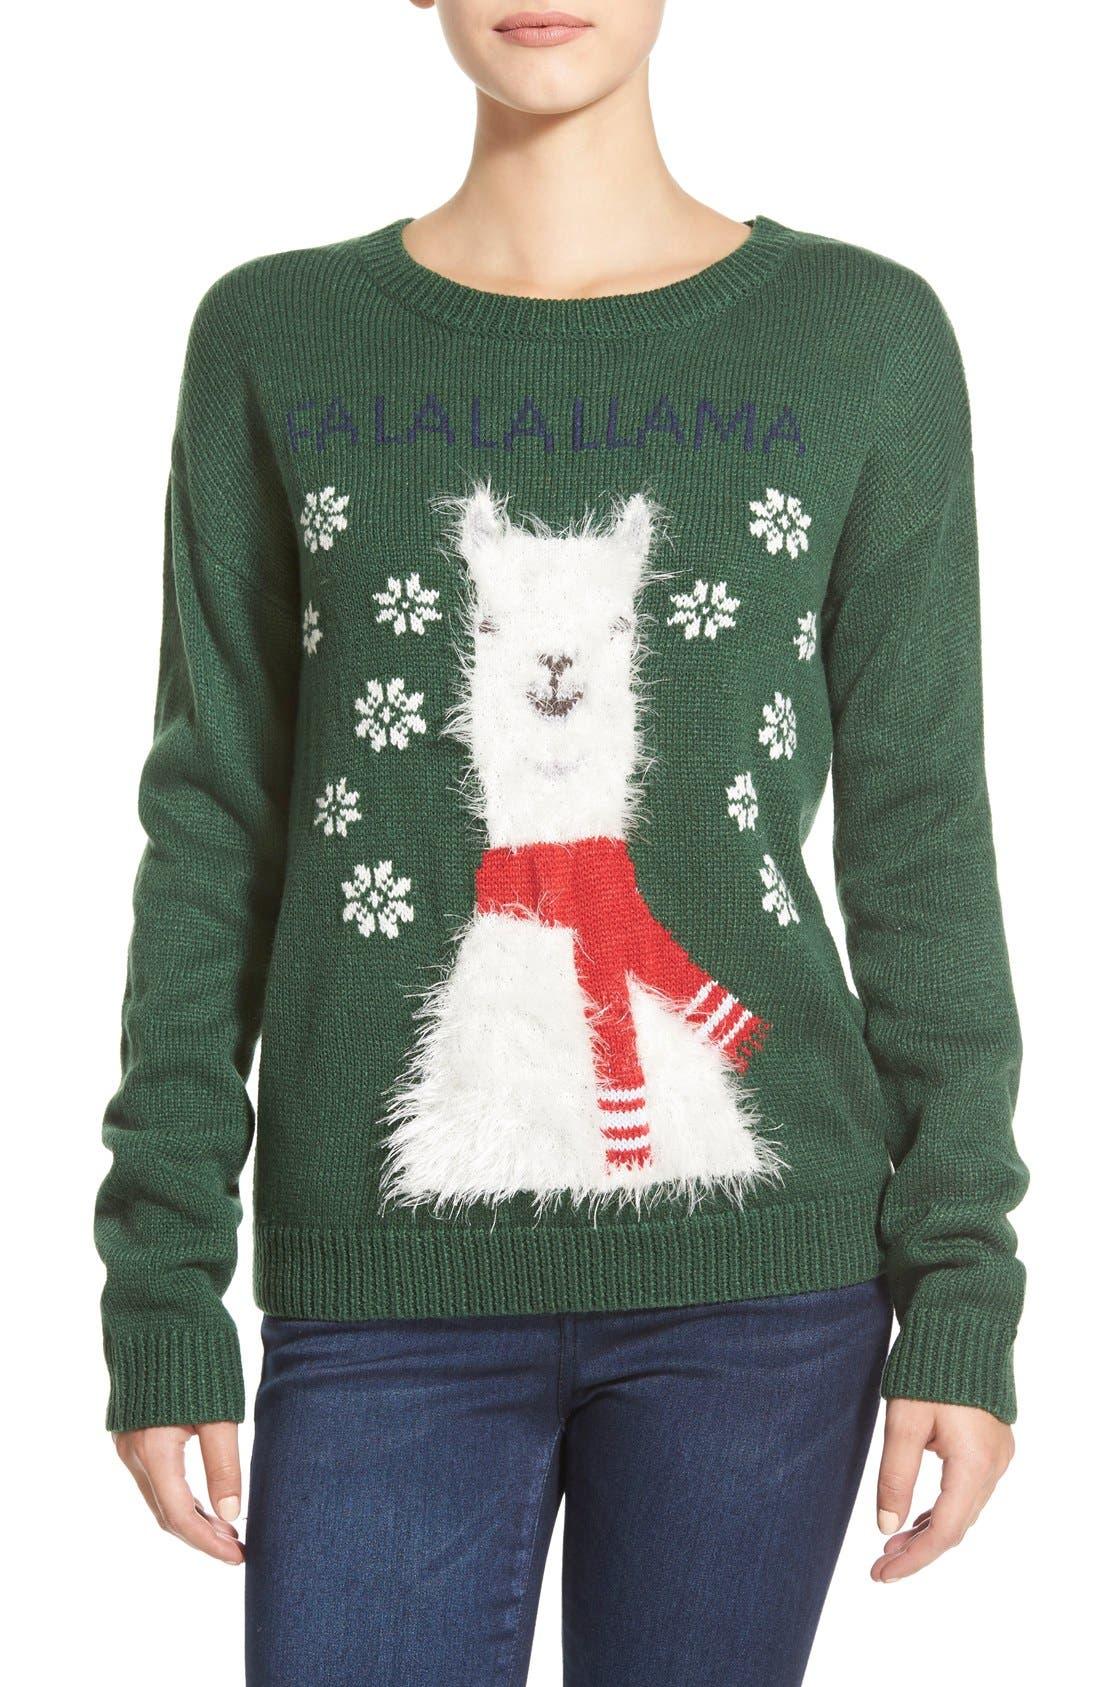 BP. 'Fa La La Llama' Graphic Christmas Sweater | Nordstrom